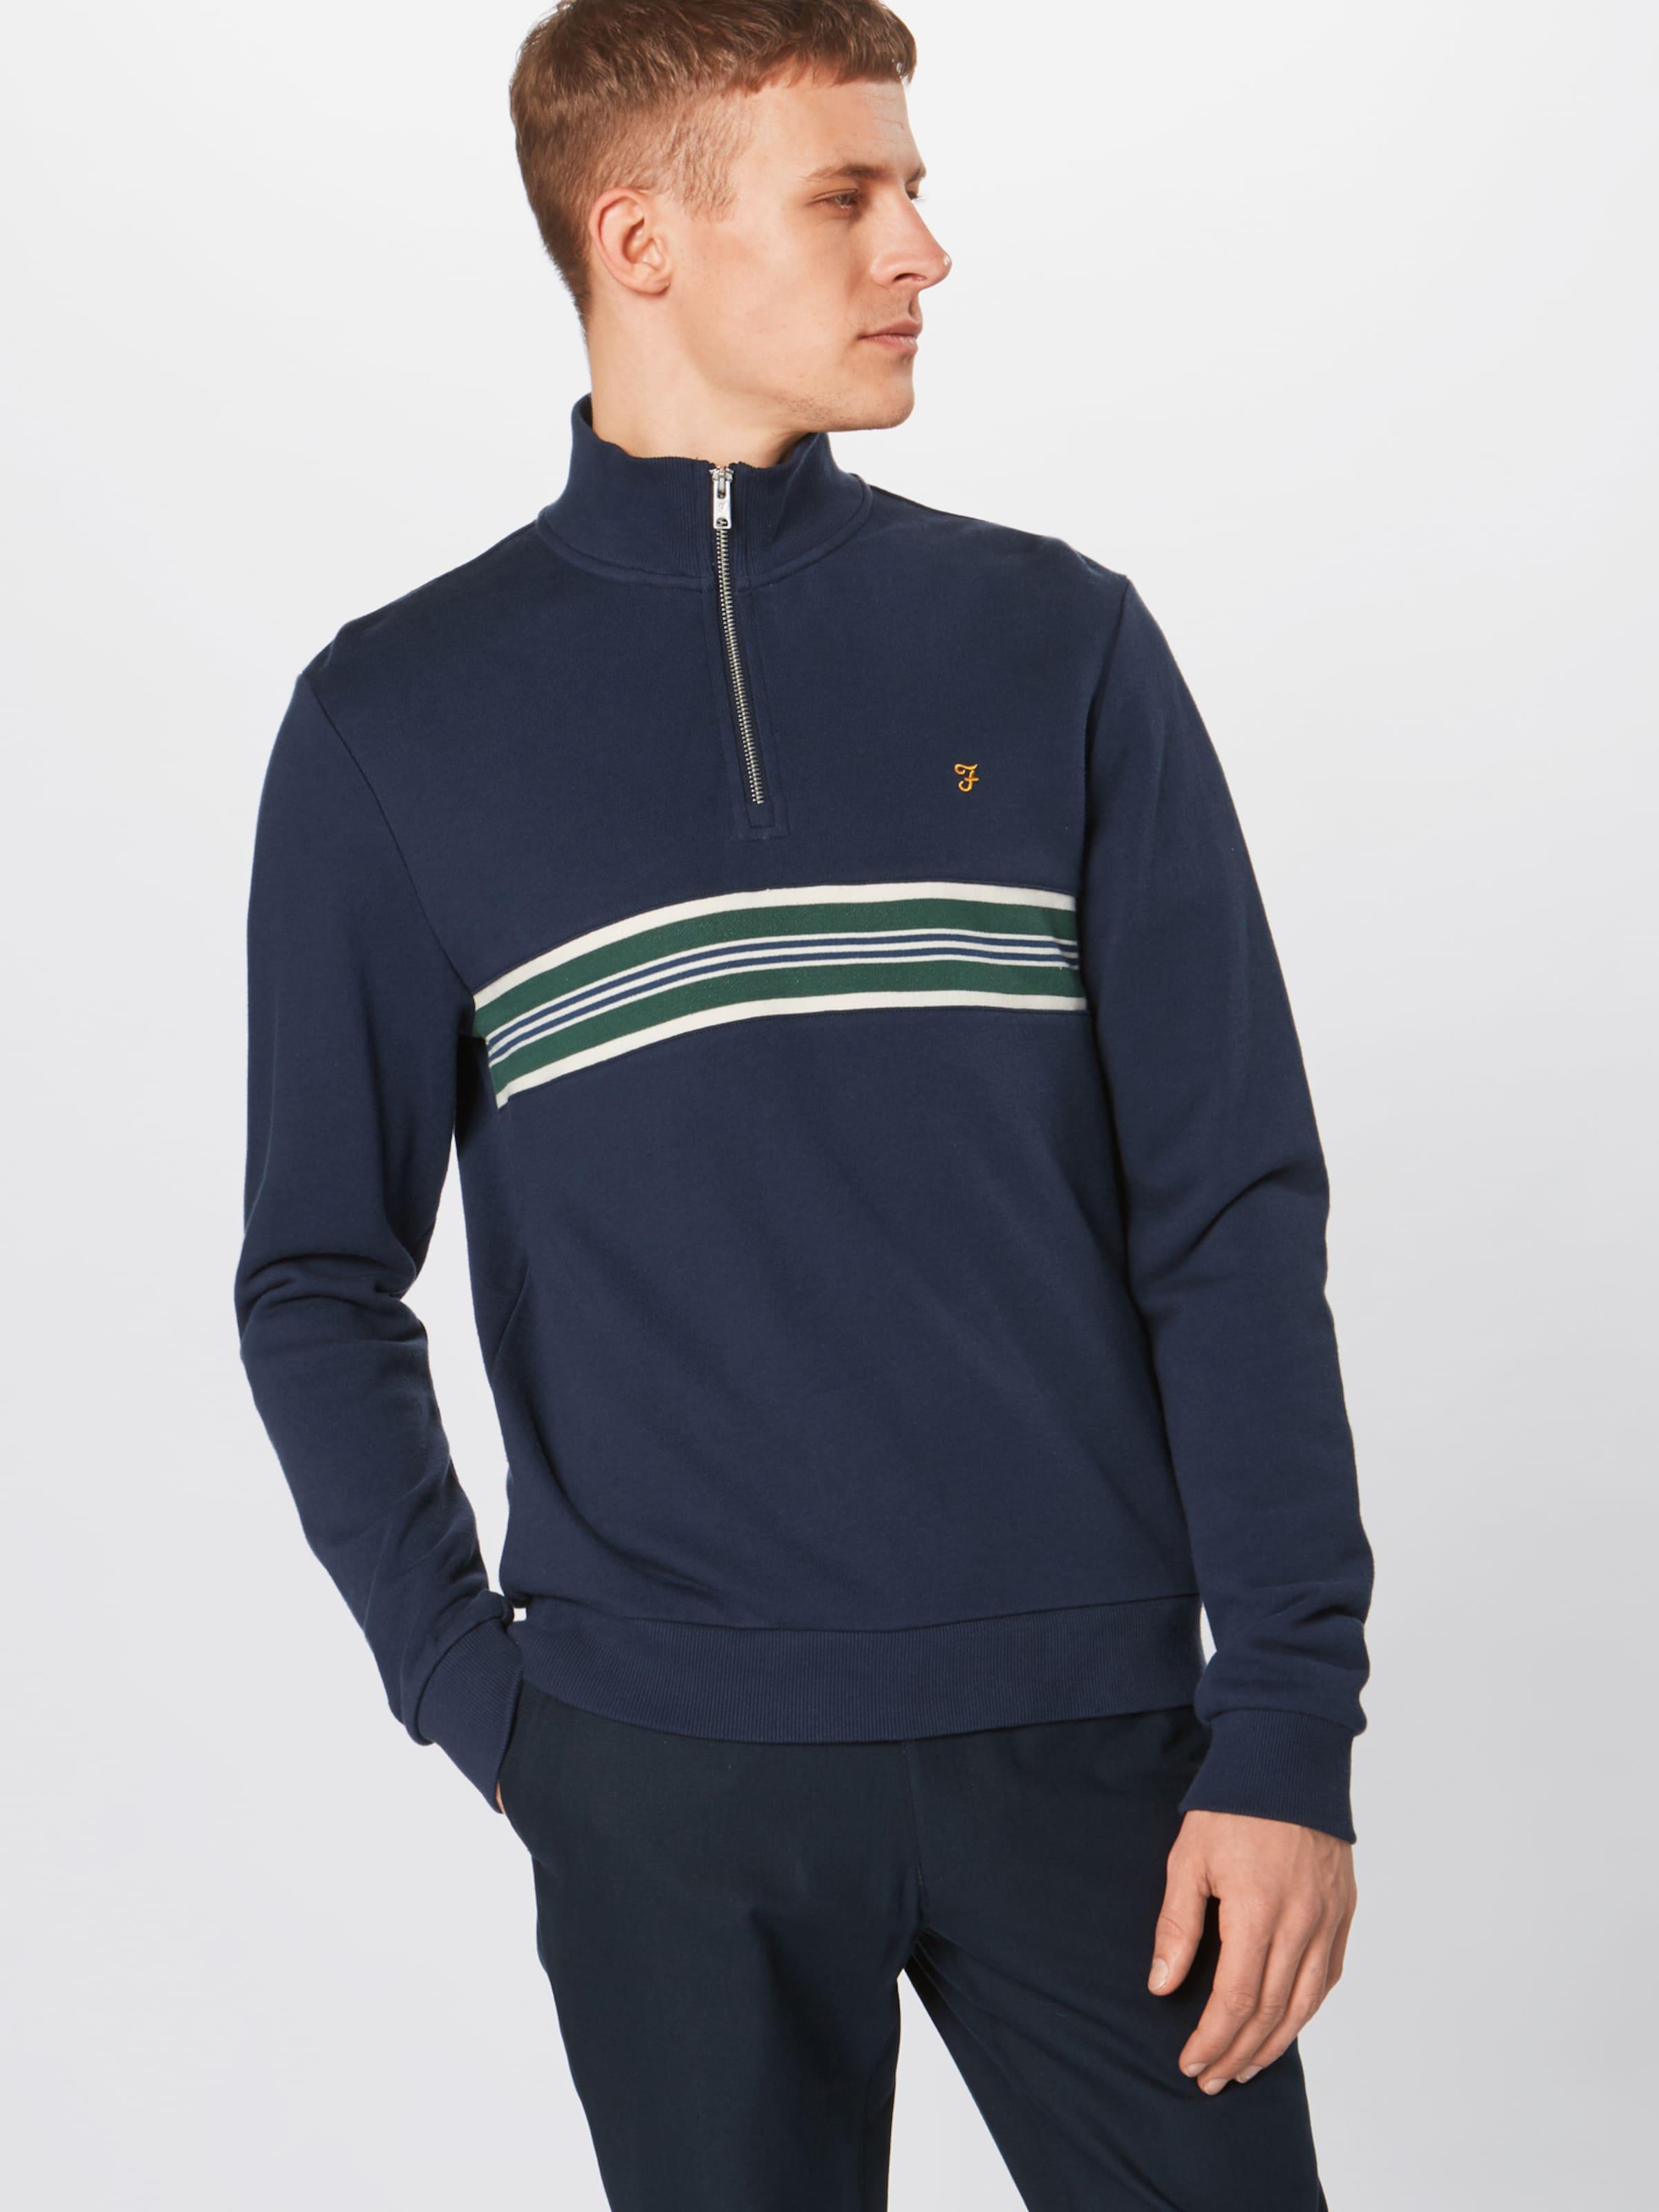 Sweatshirt 'leeds' In Farah DunkelblauDunkelgrün Weiß 1KJFcTl3